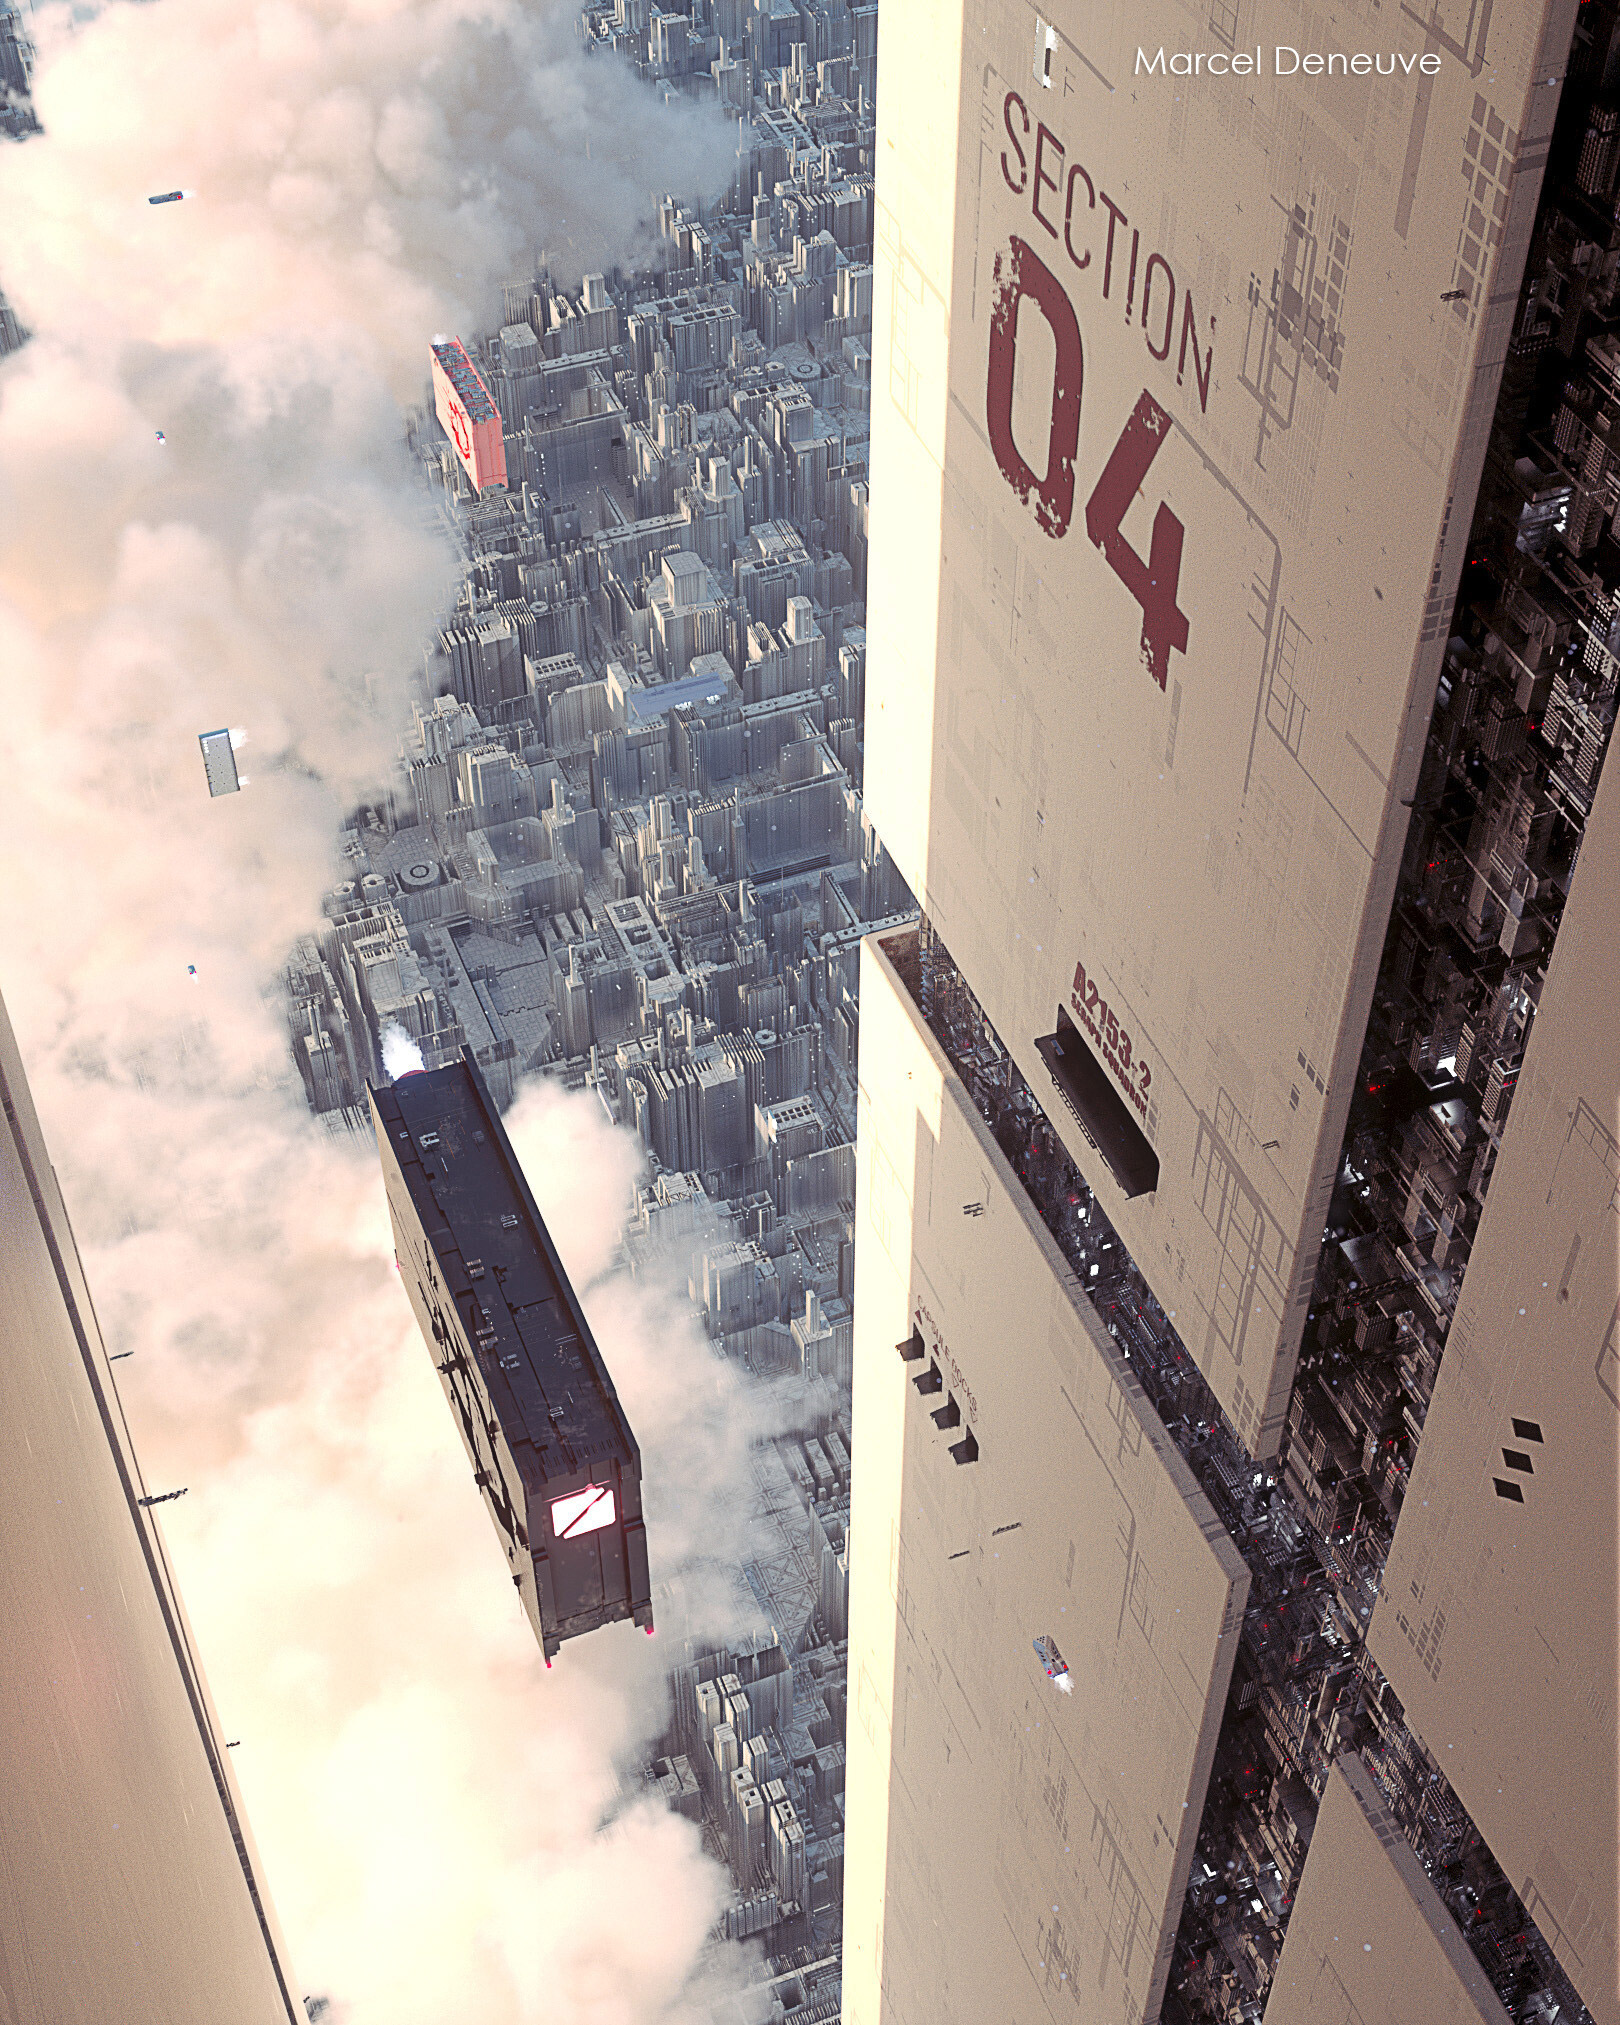 The Impressive Sci-Fi Art of Marcel Deneuve